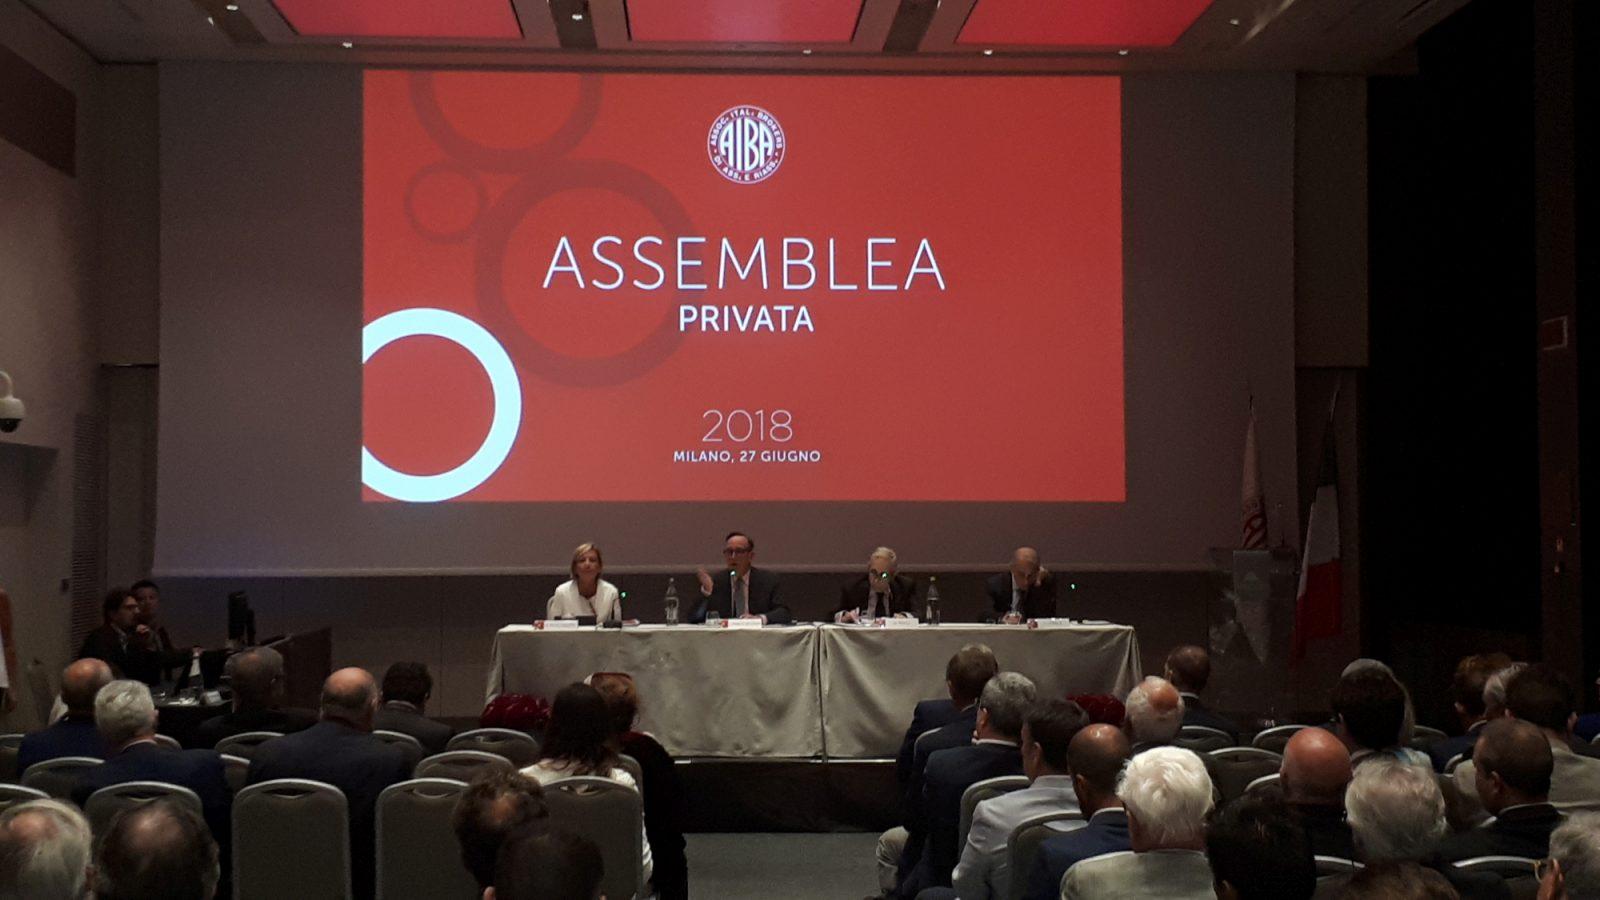 AIBA - Assemblea 2018 Imc